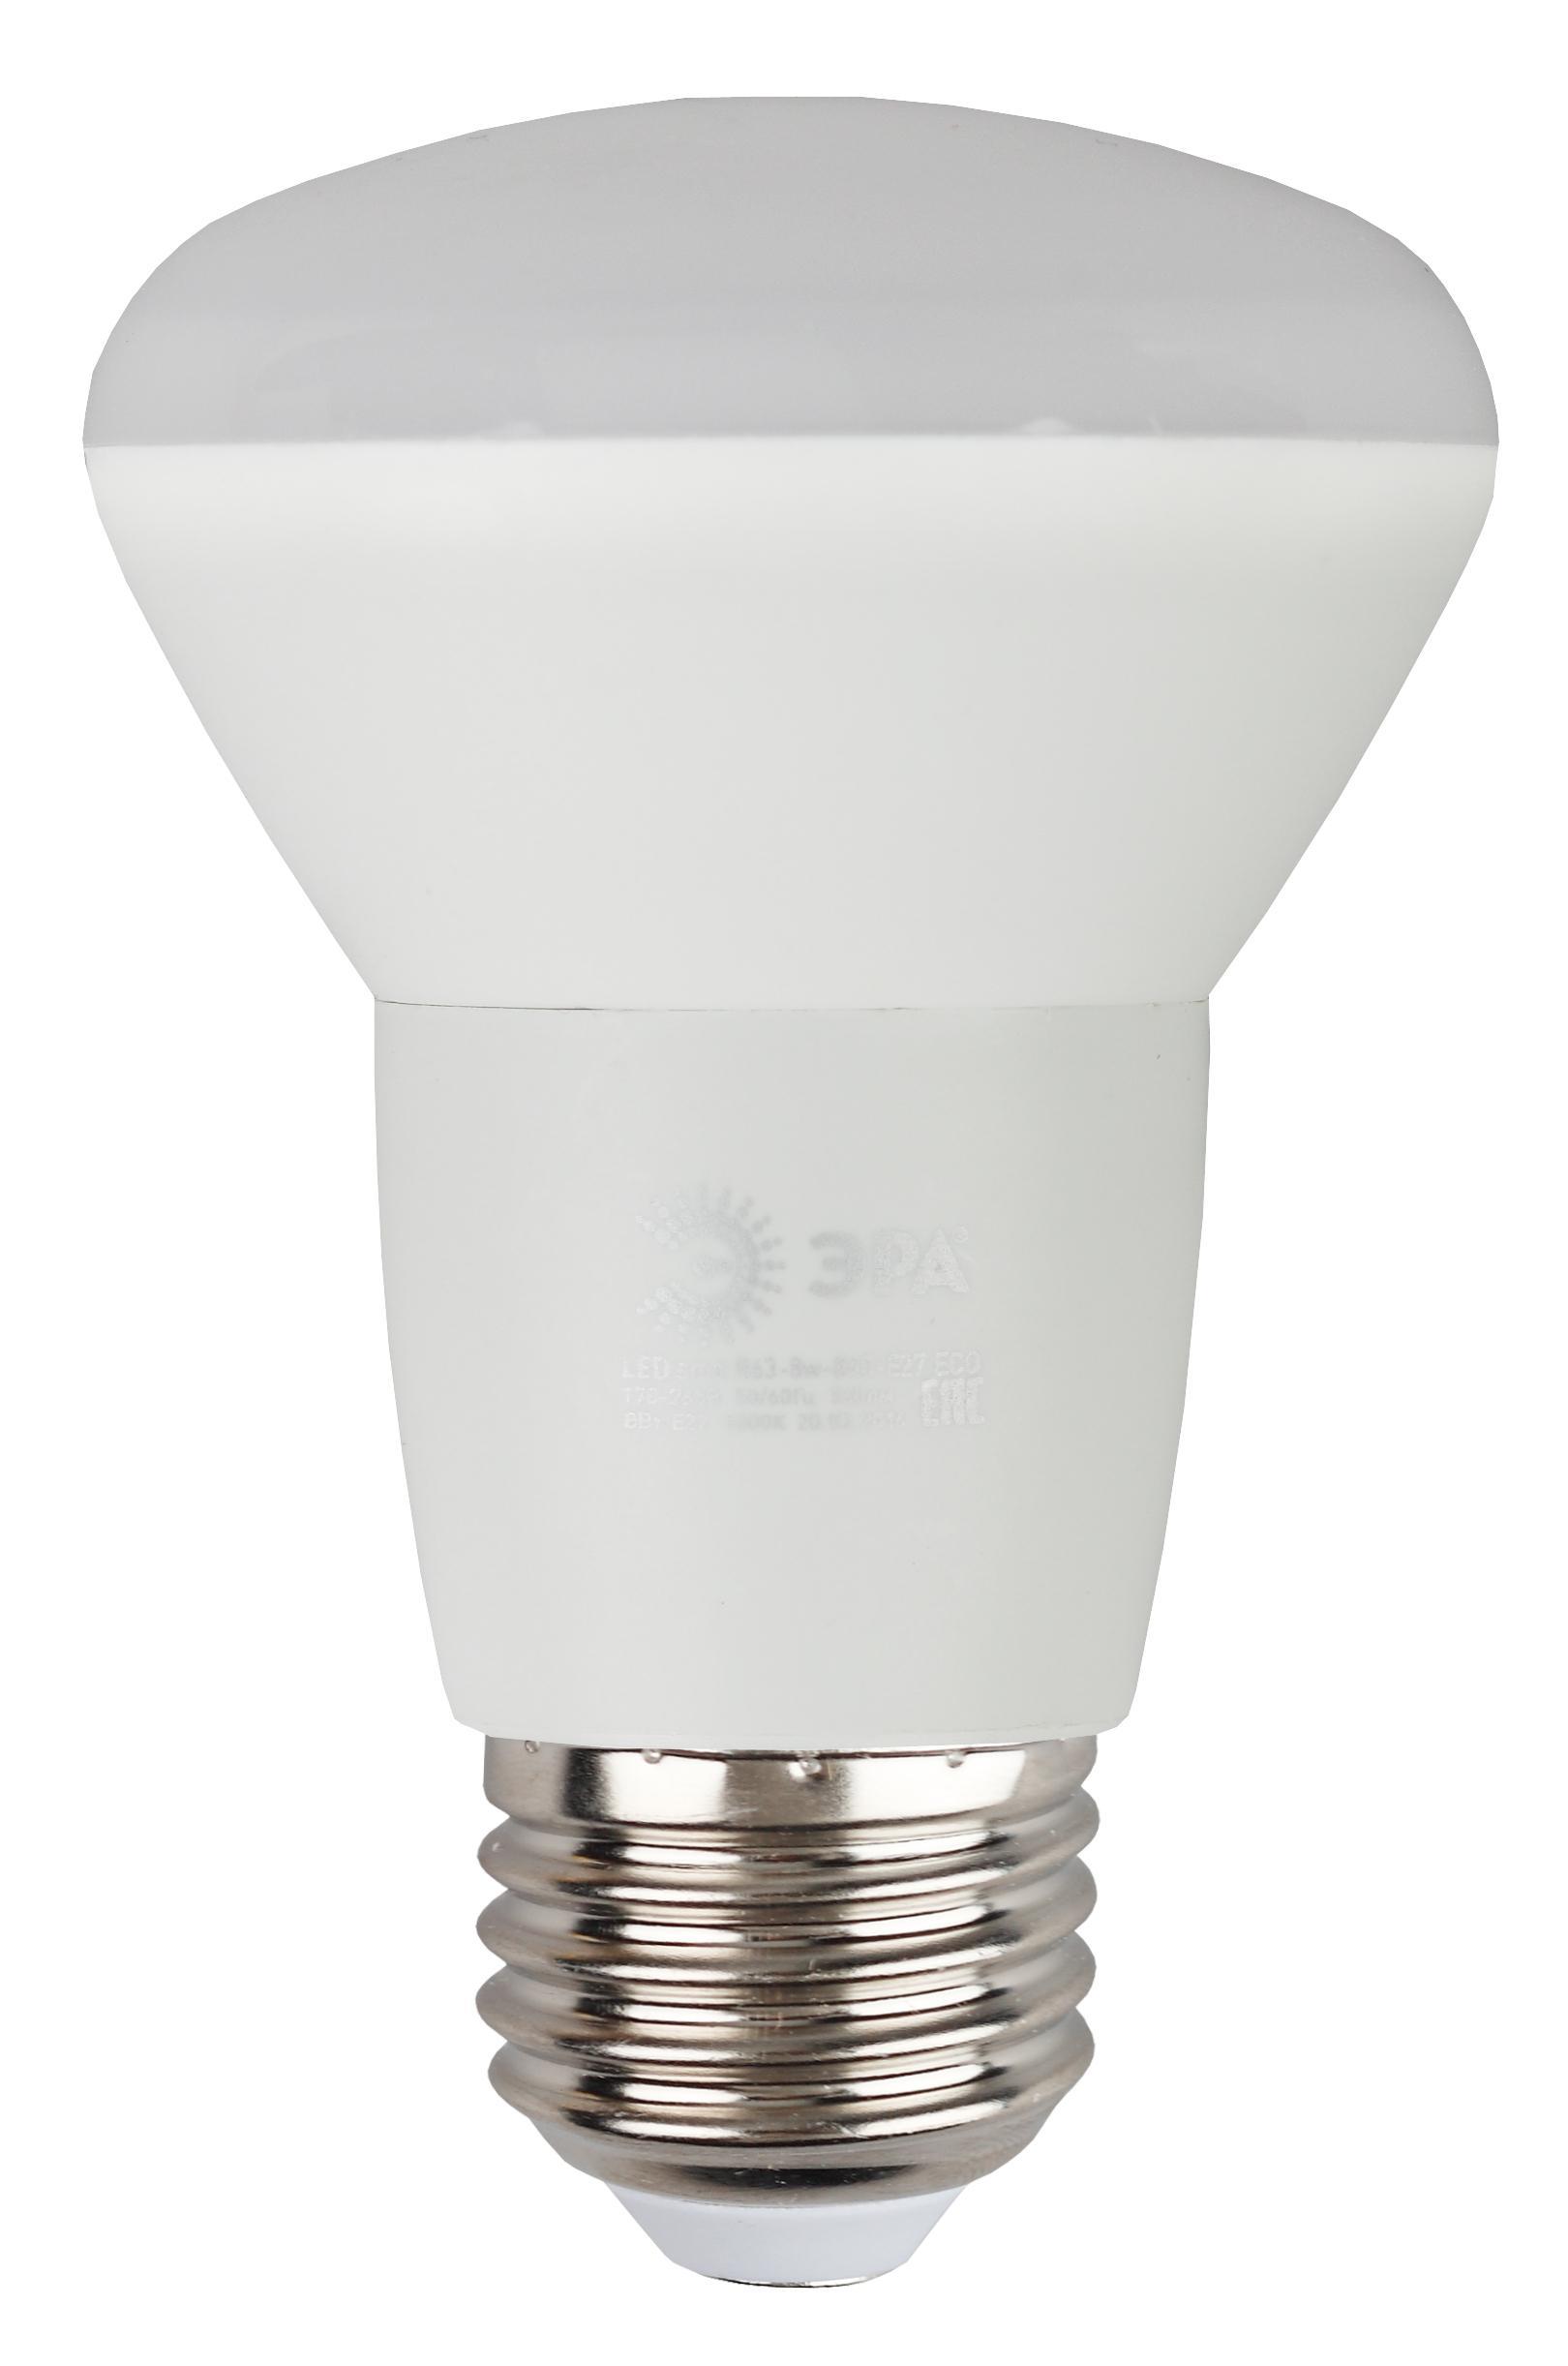 Лампа светодиодная ЭРА Led smd r63-8w-827-e27 eco